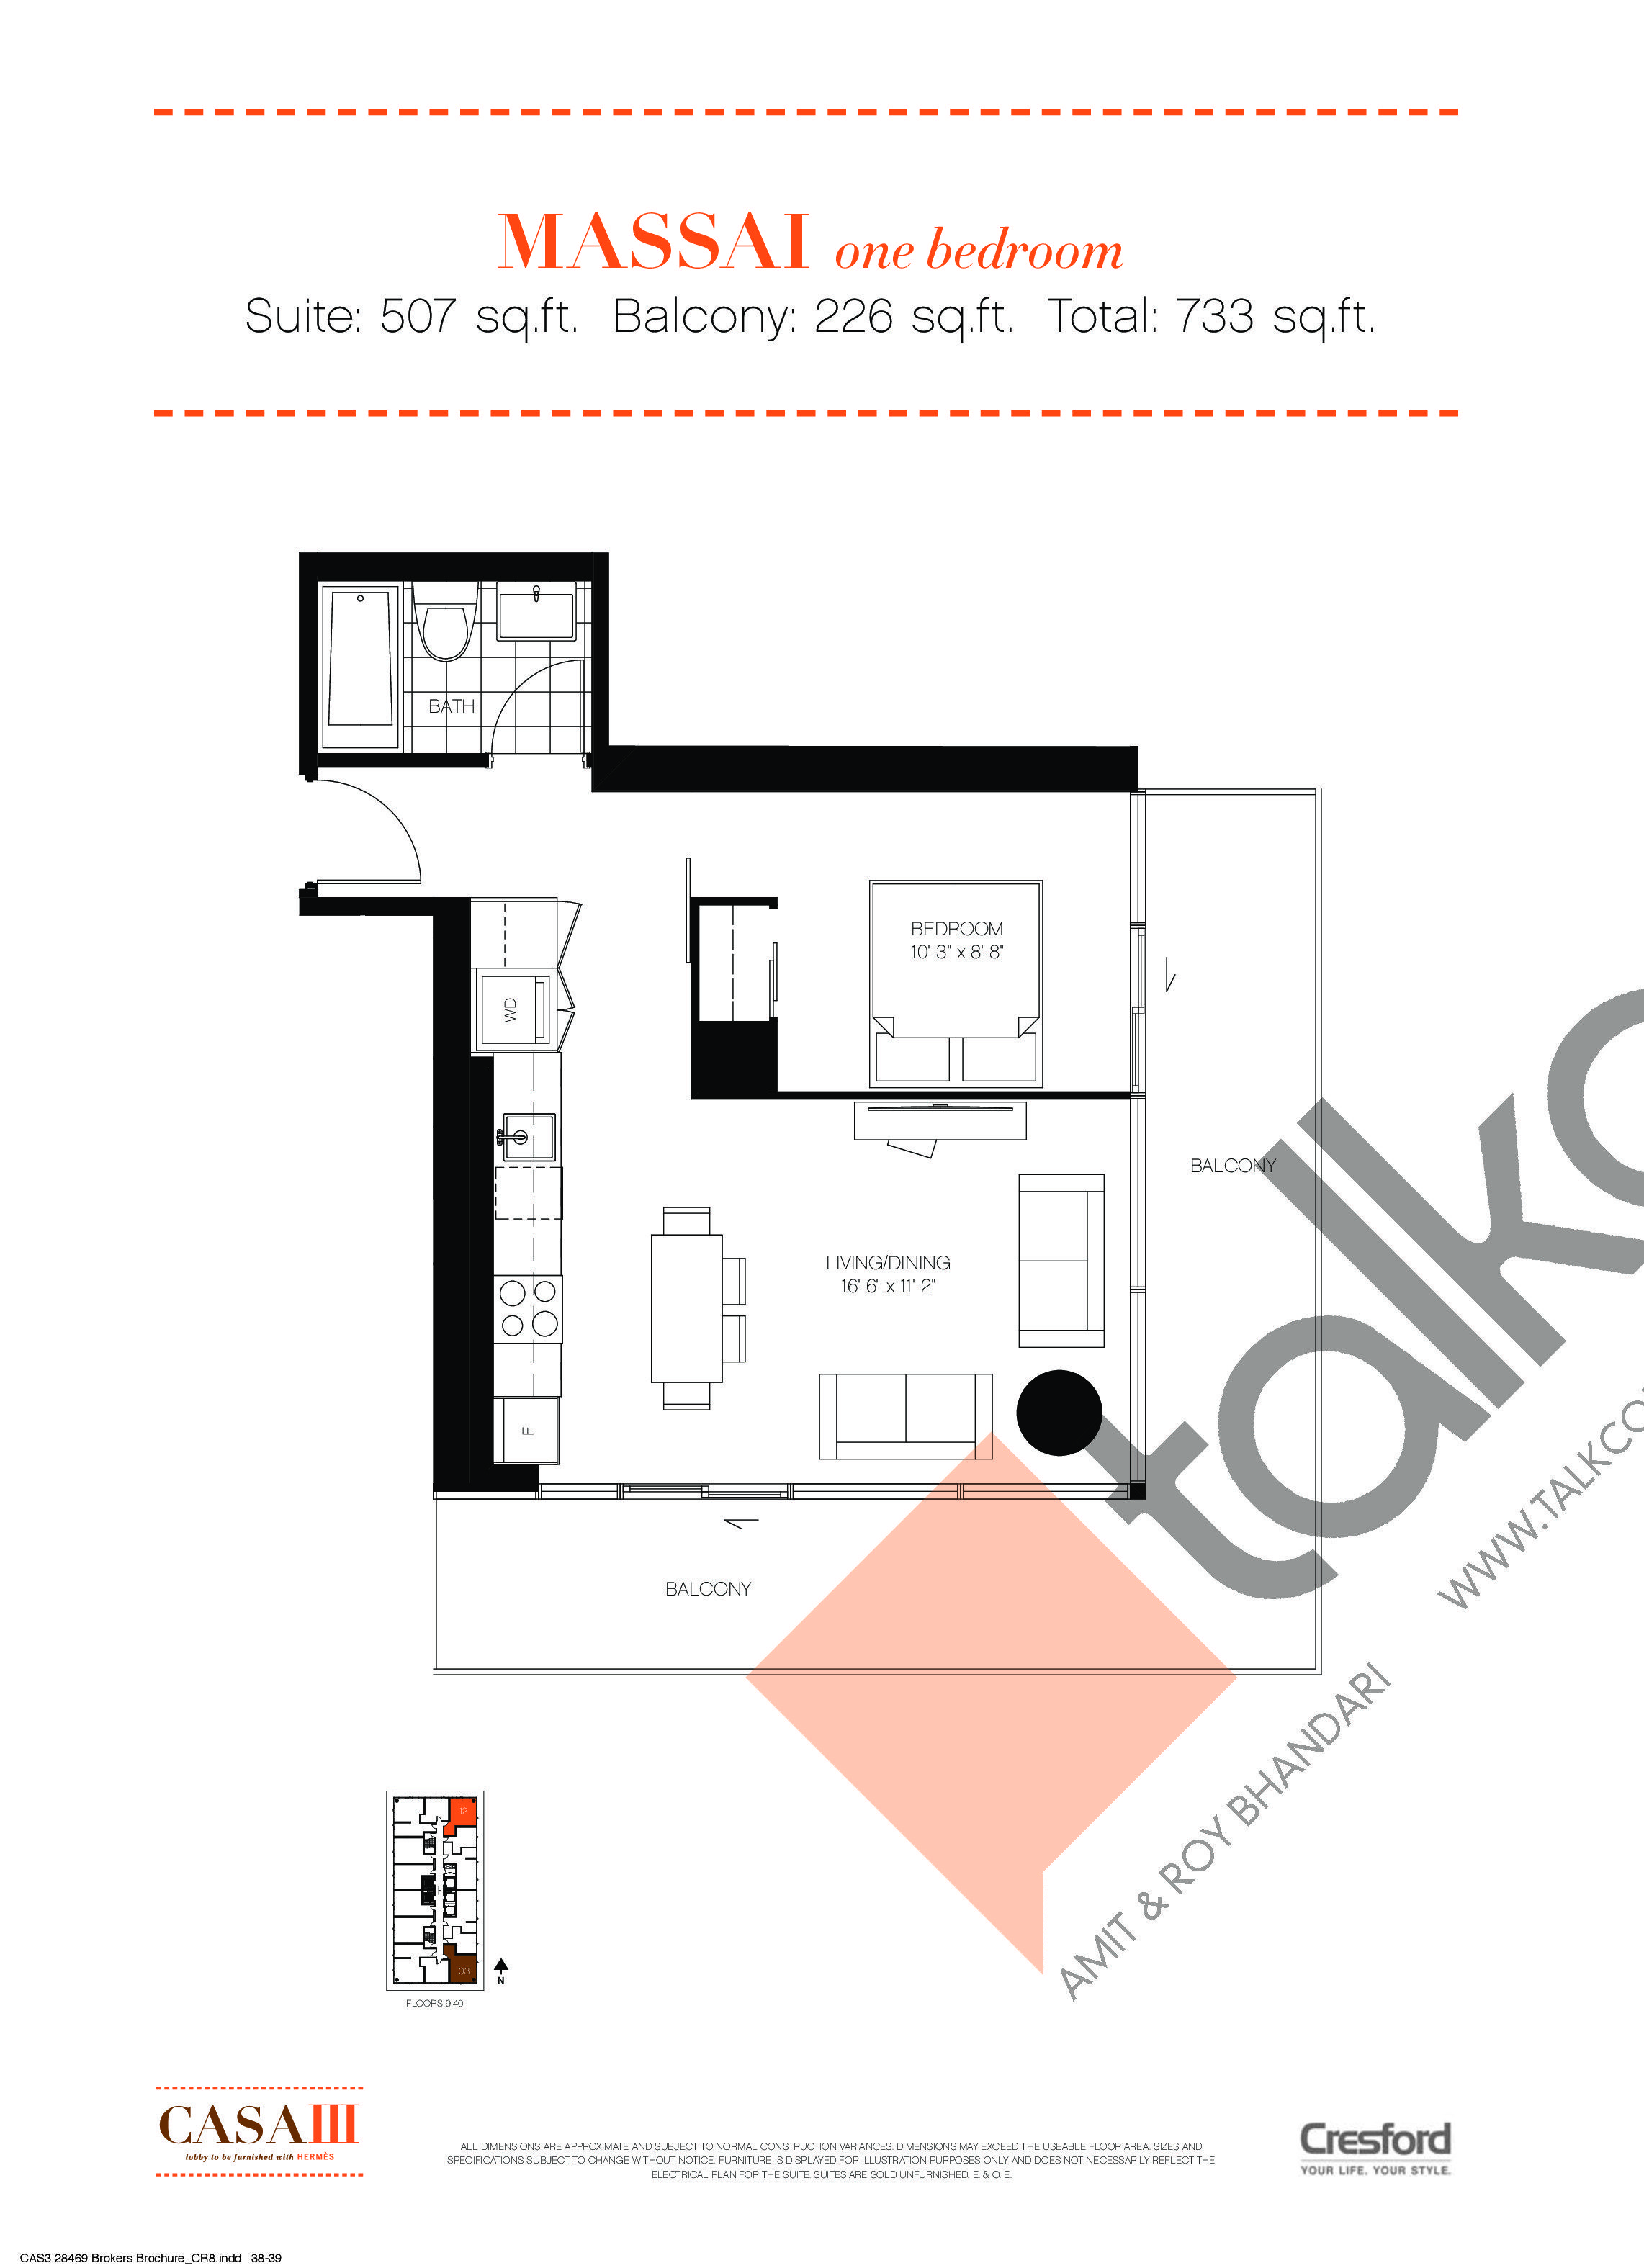 Massai Floor Plan at CASA 3 Condos - 507 sq.ft